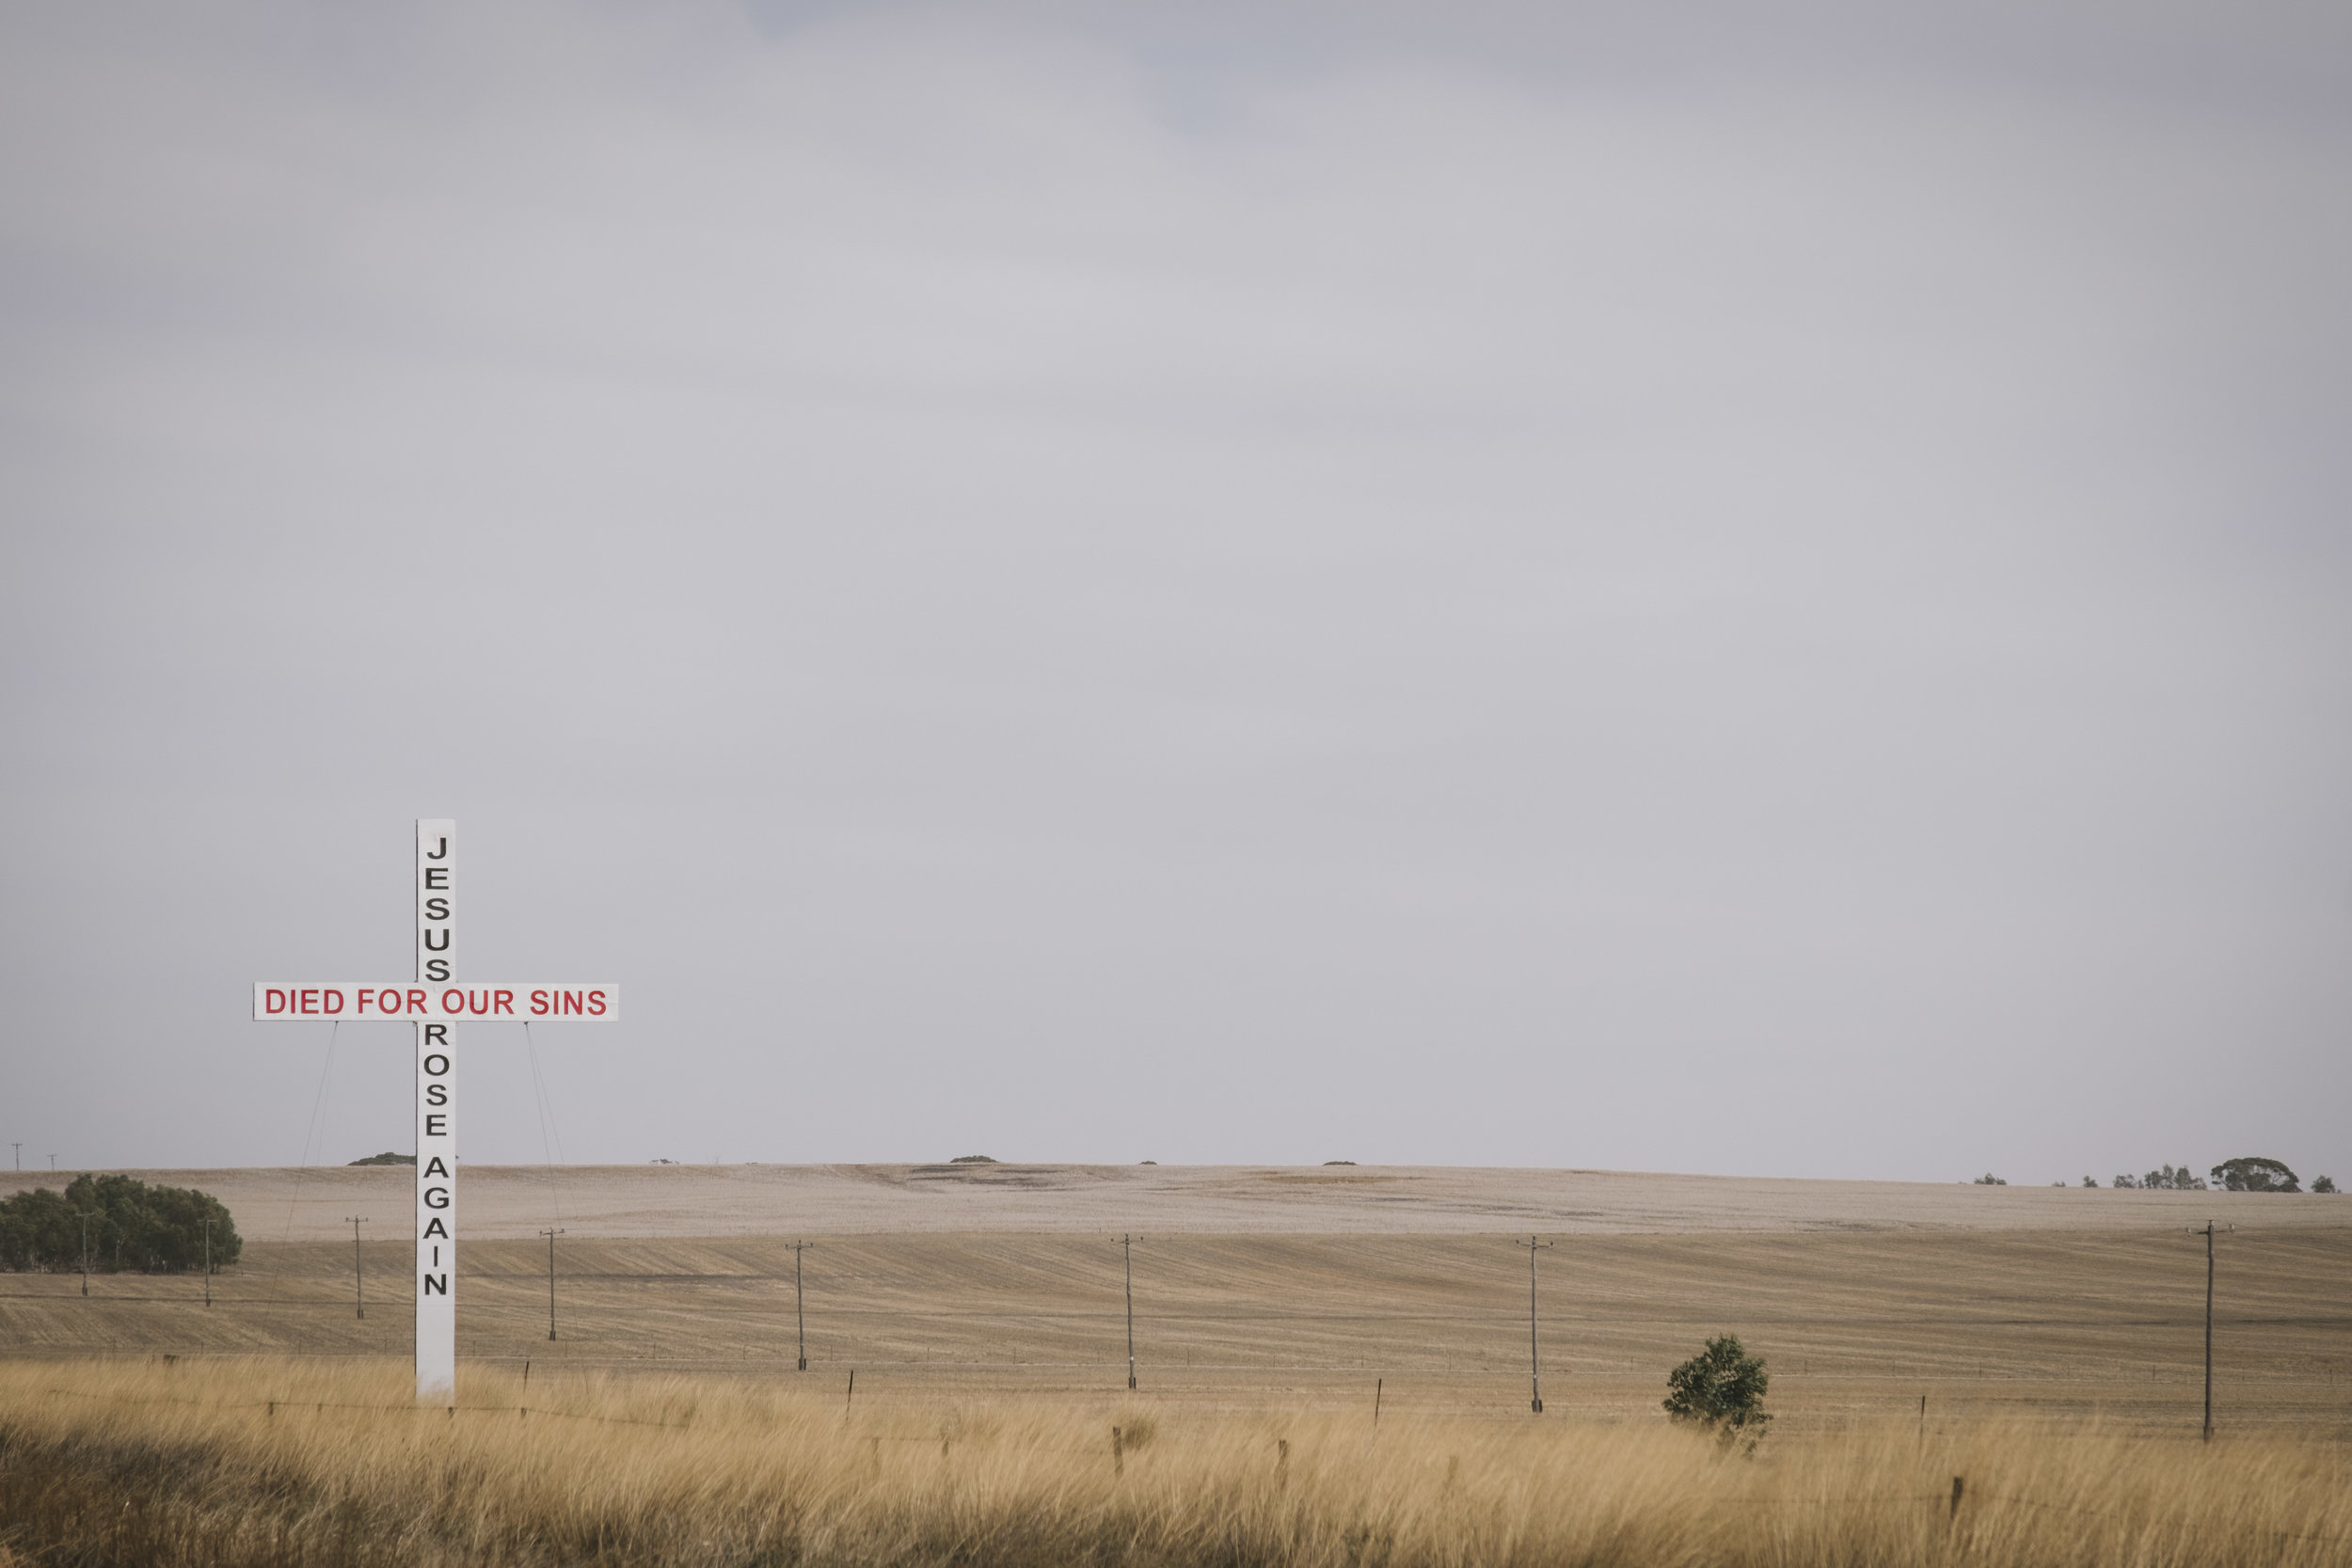 Angie Roe Photography Wheatbelt Rural Farm Landscape Seeding (2).jpg